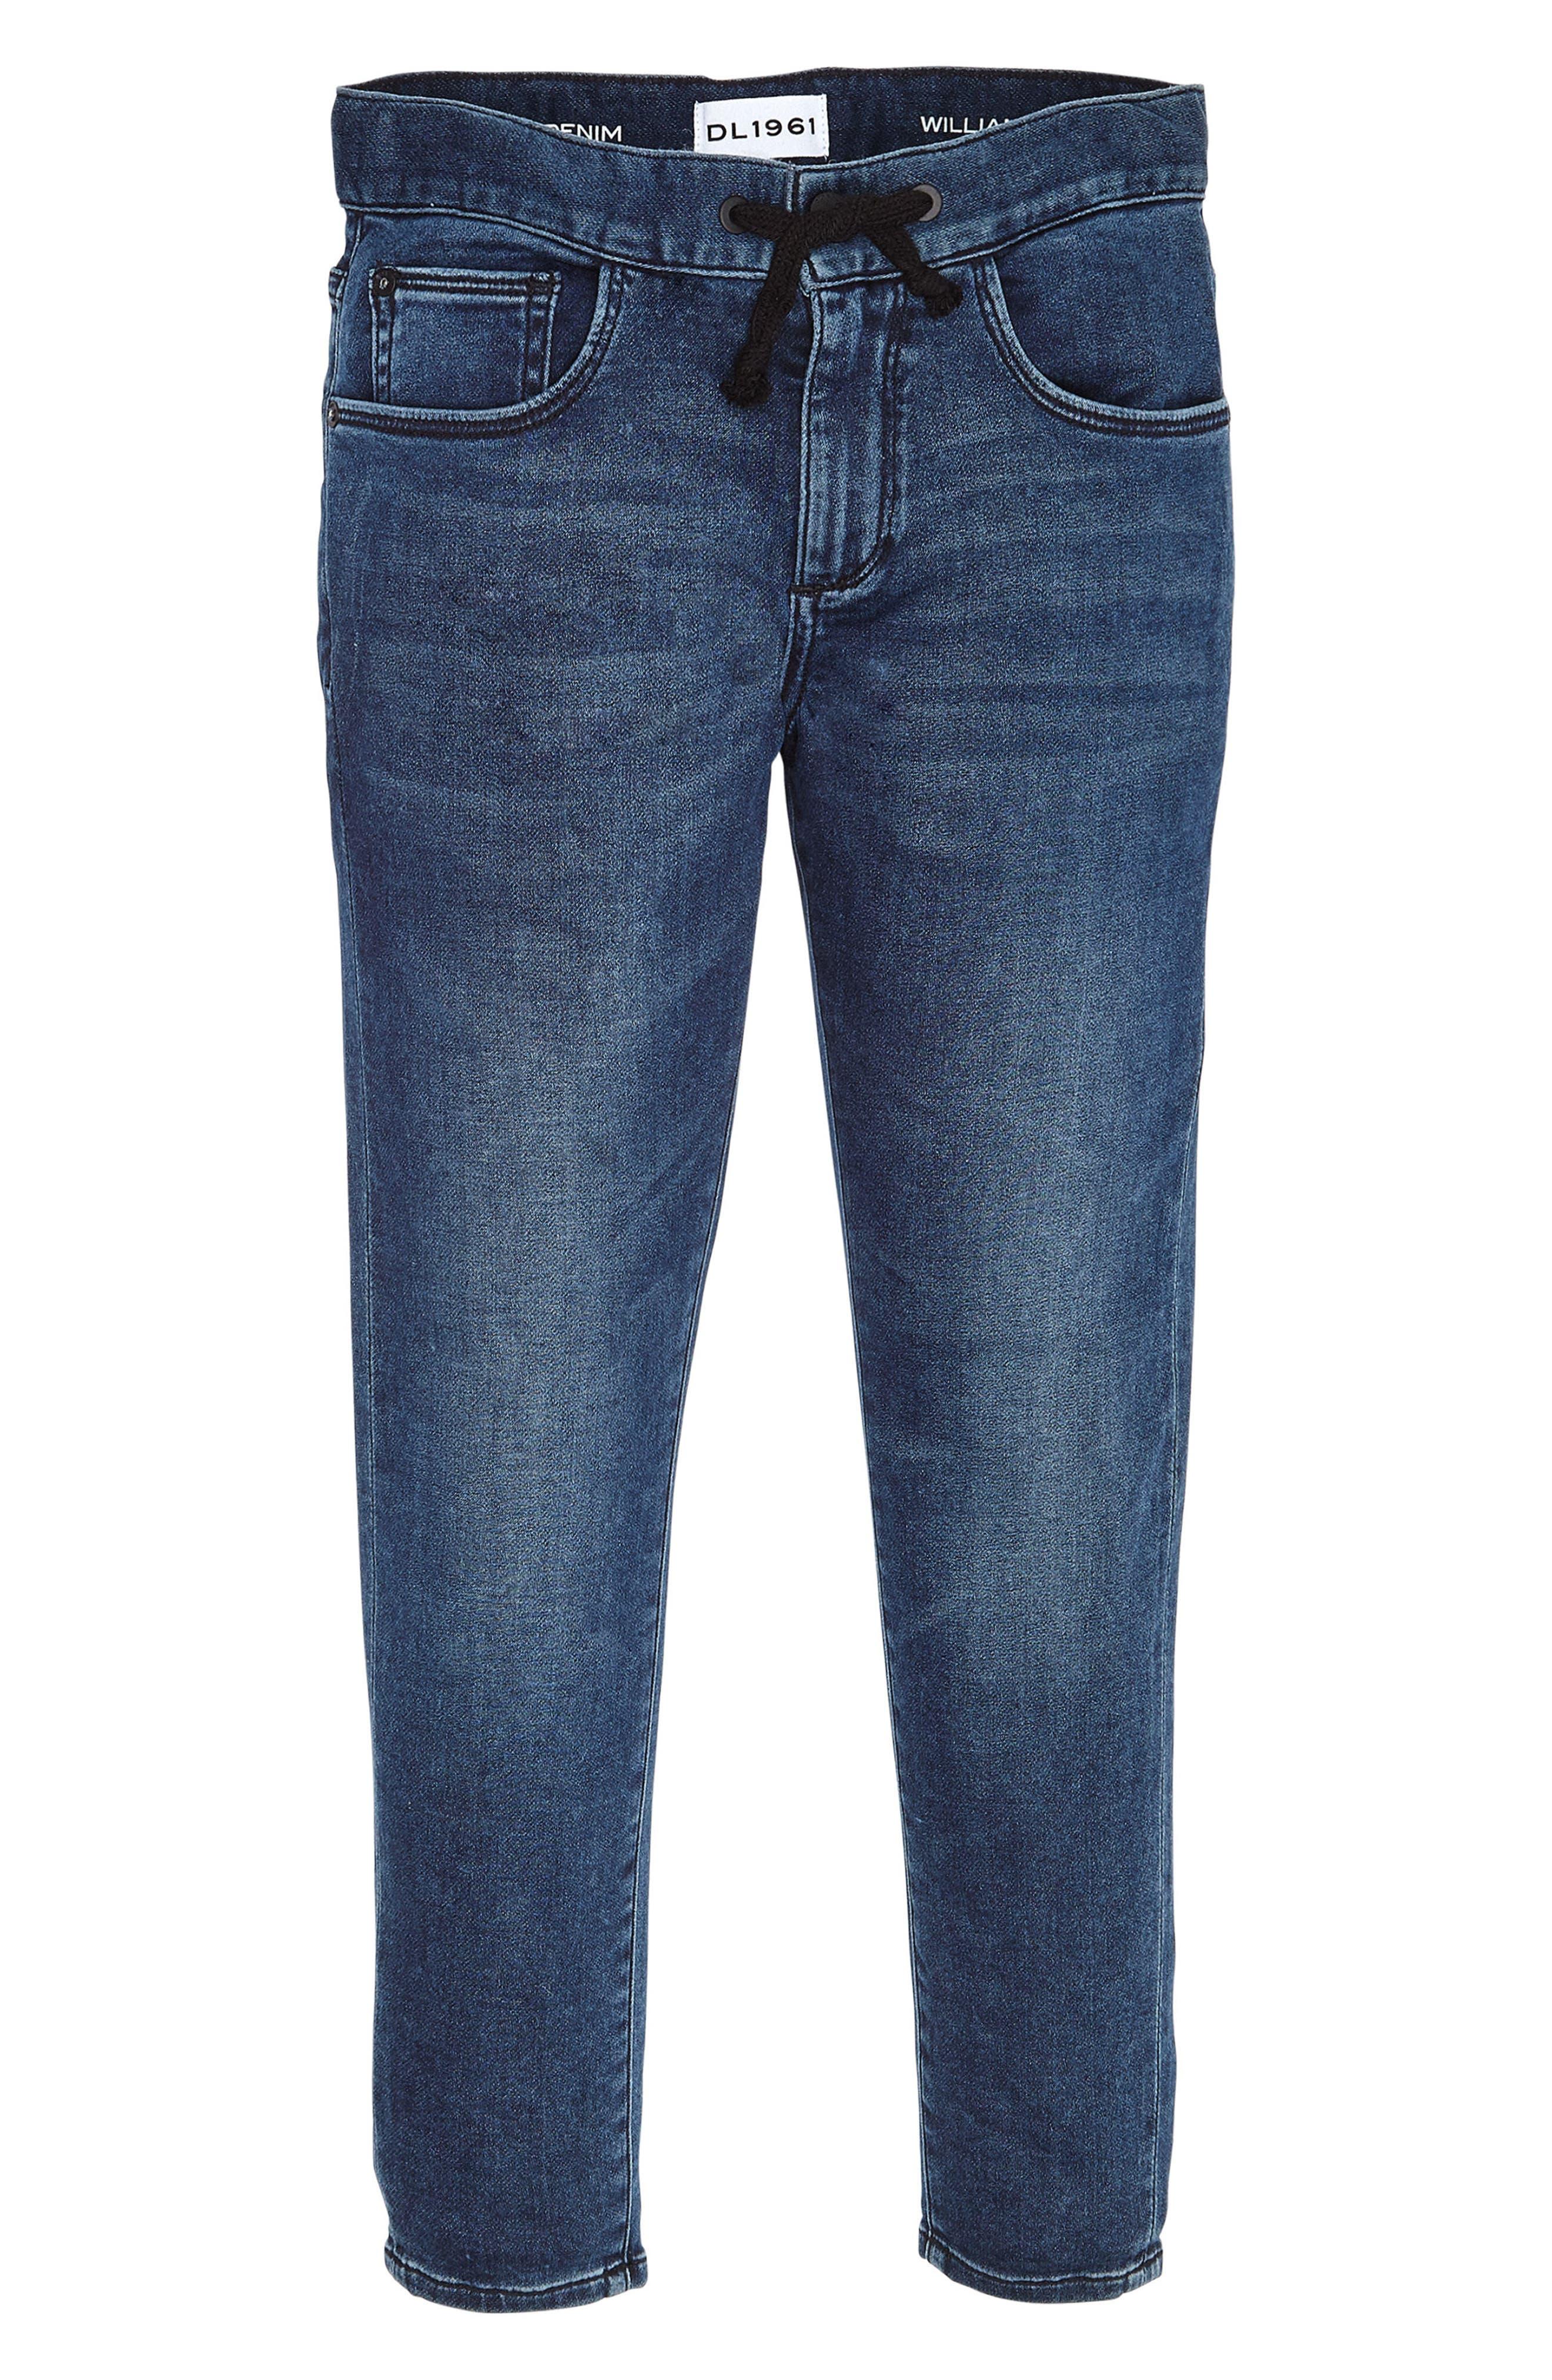 DL1961 William Drawstring Jeans (Toddler Boys & Little Boys)